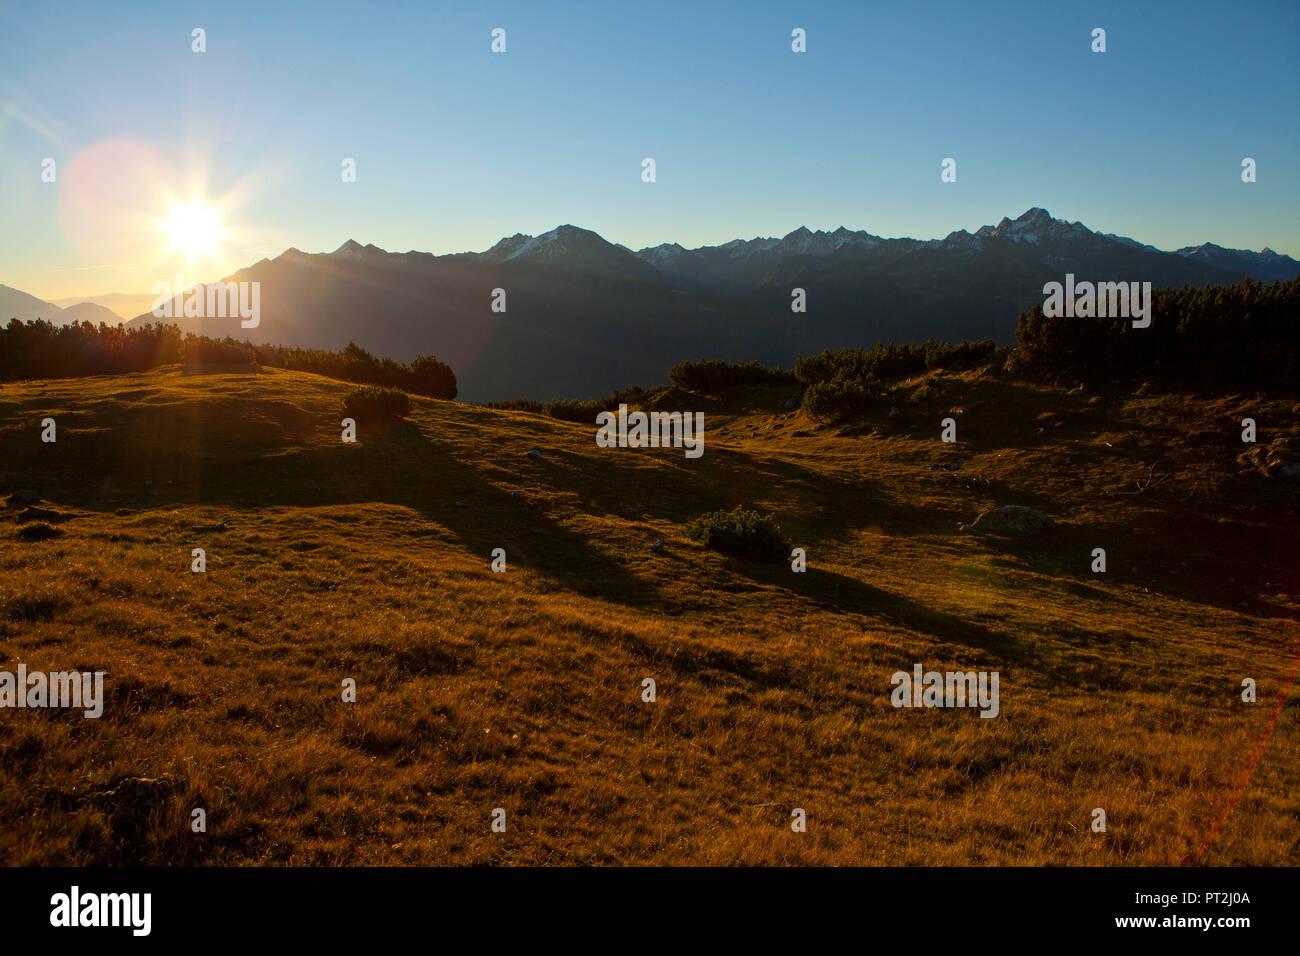 Austria, Tyrol, Obsteig, sunrise on the Simmering - Stock Image